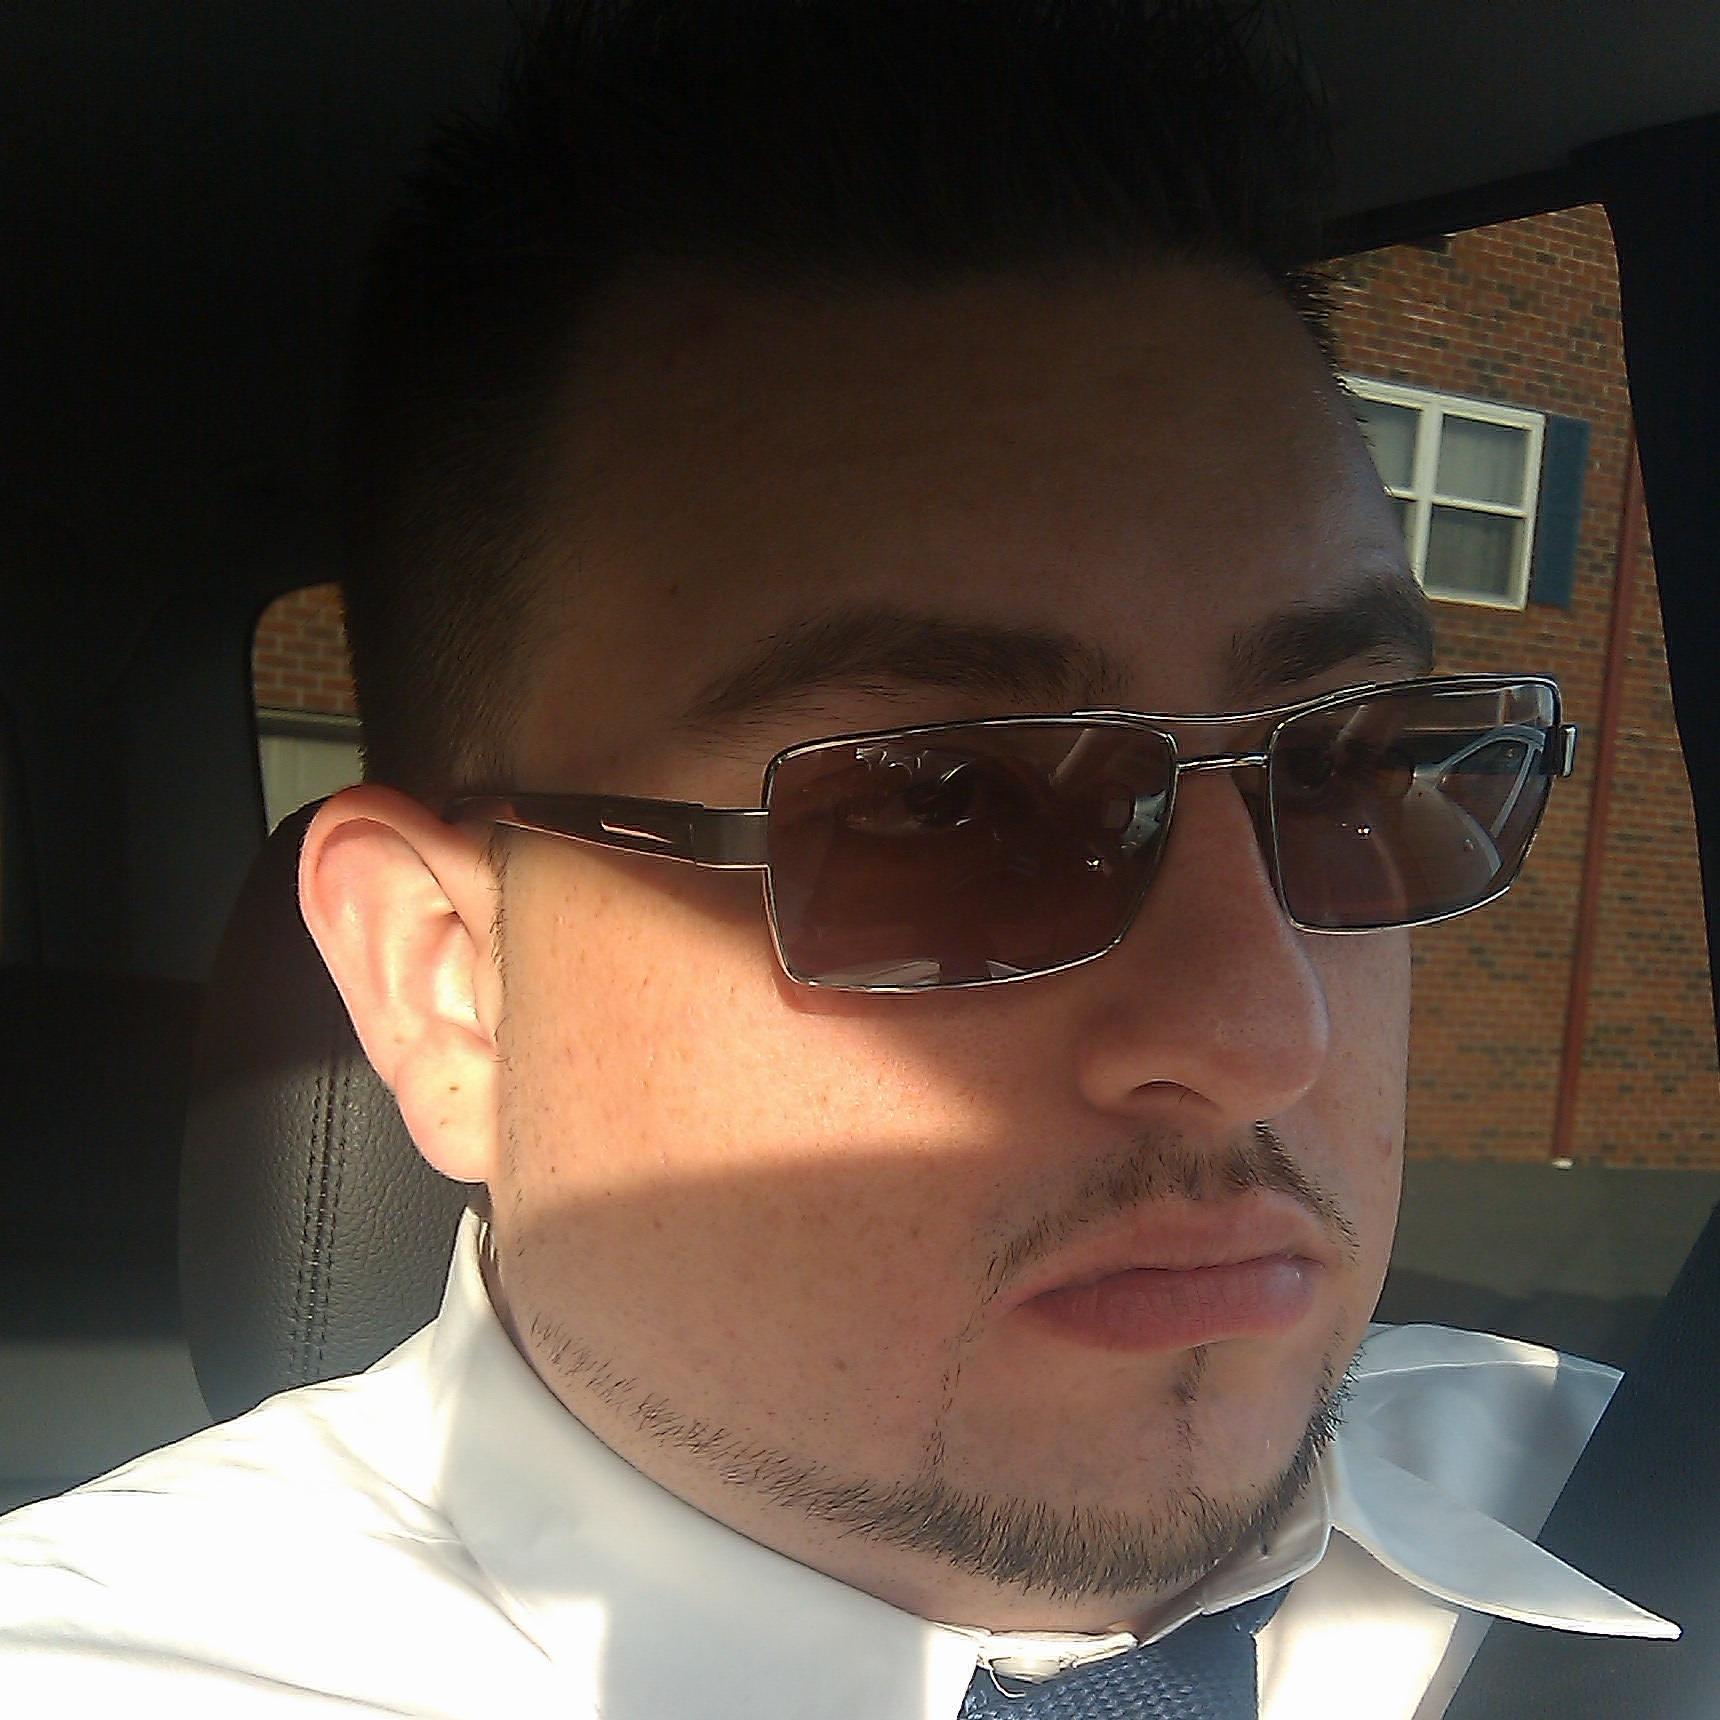 Christian Luzuriaga